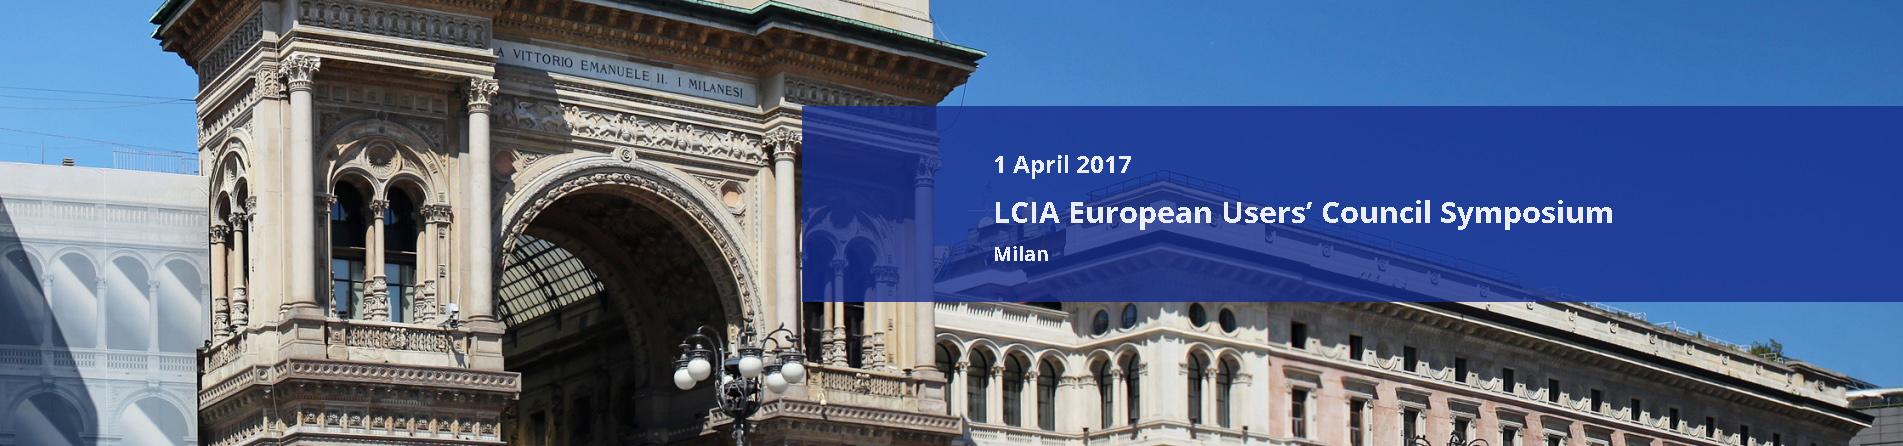 International Arbitration | White & Case LLP